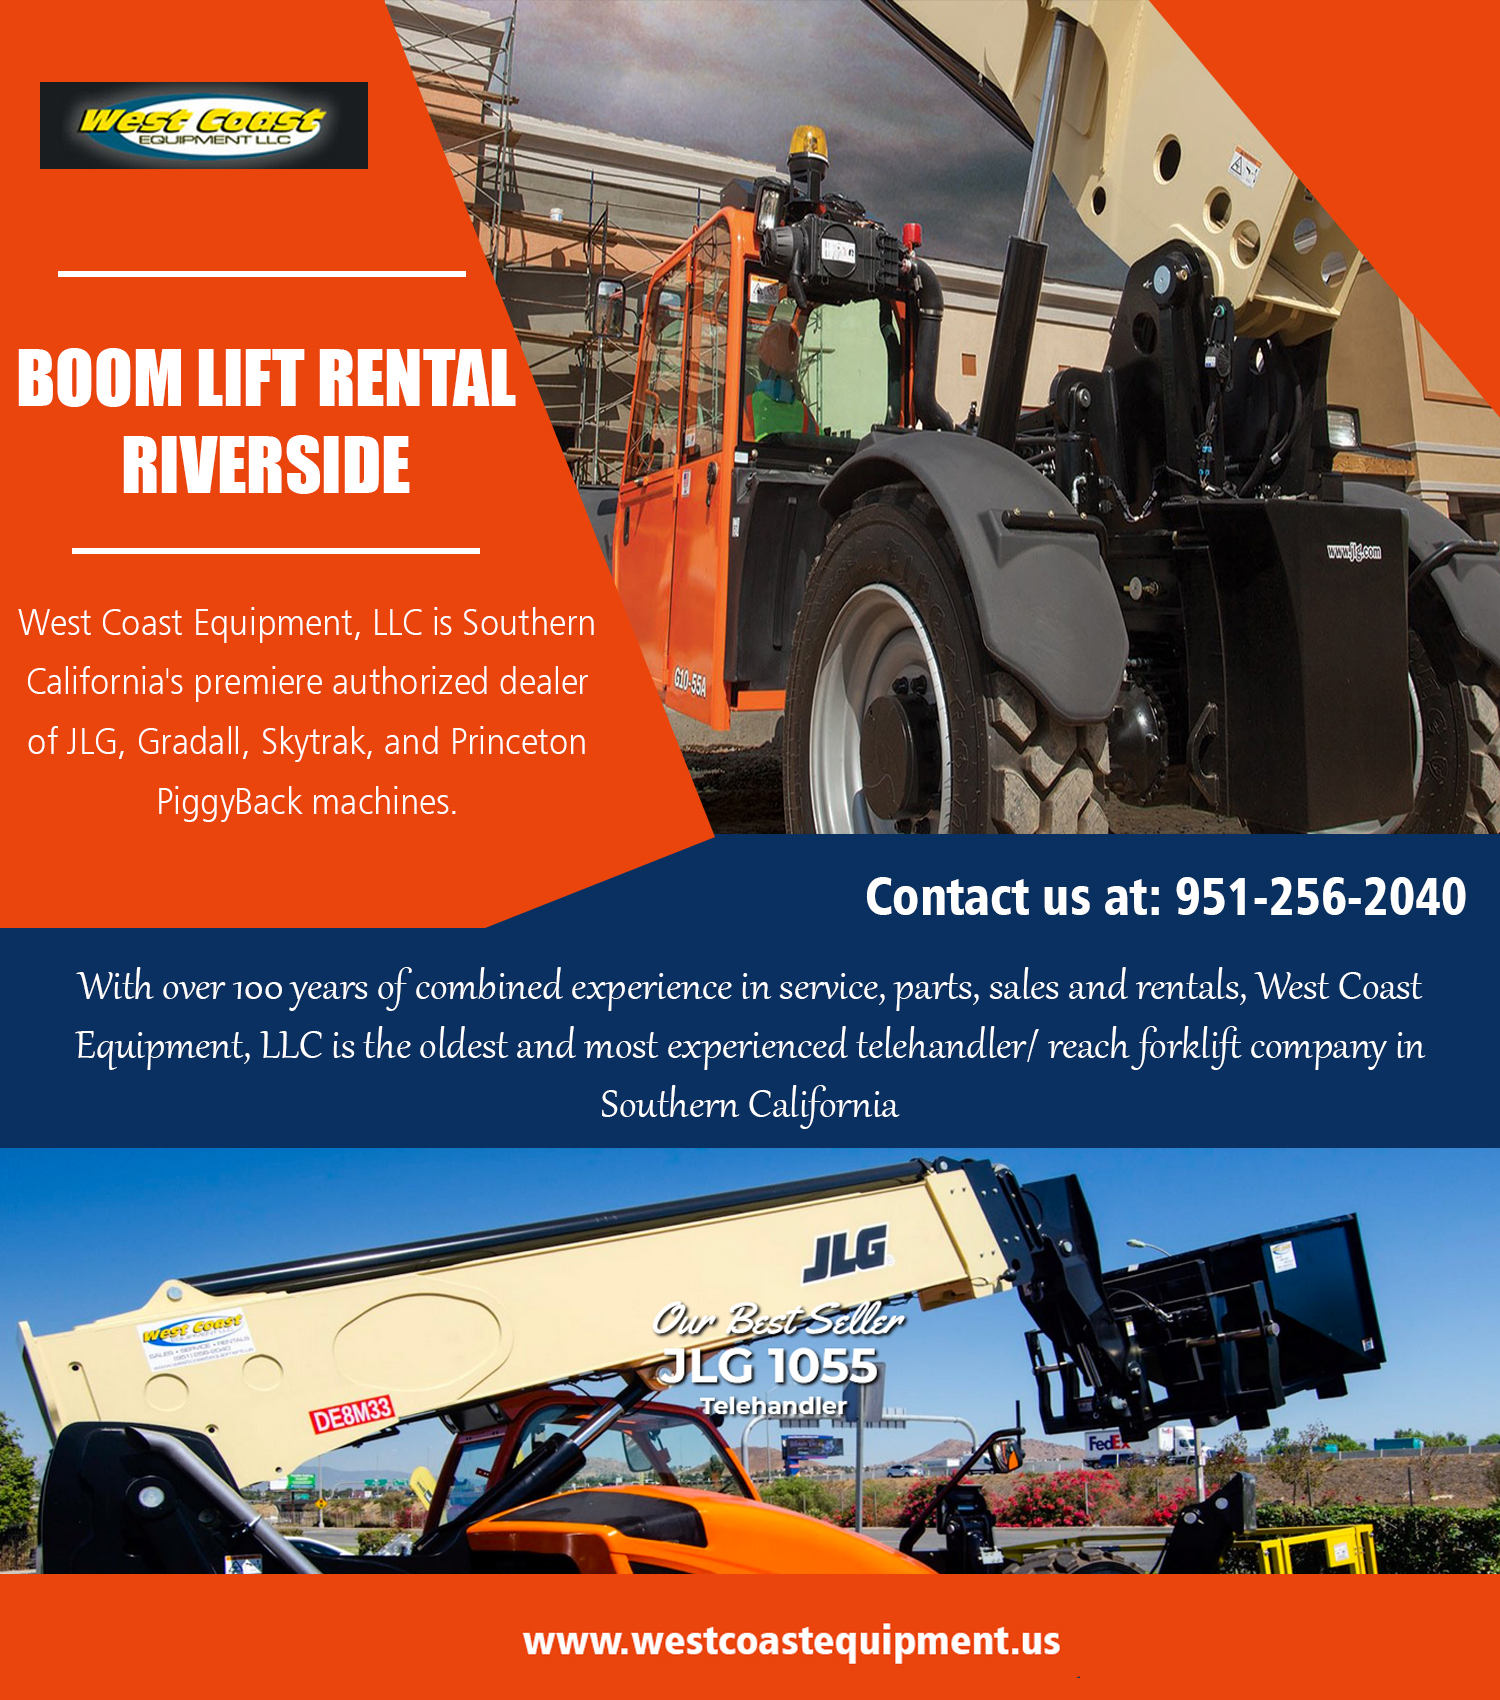 Boom Lift Rental in Riverside – Reach Forklift Rental Los Angeles